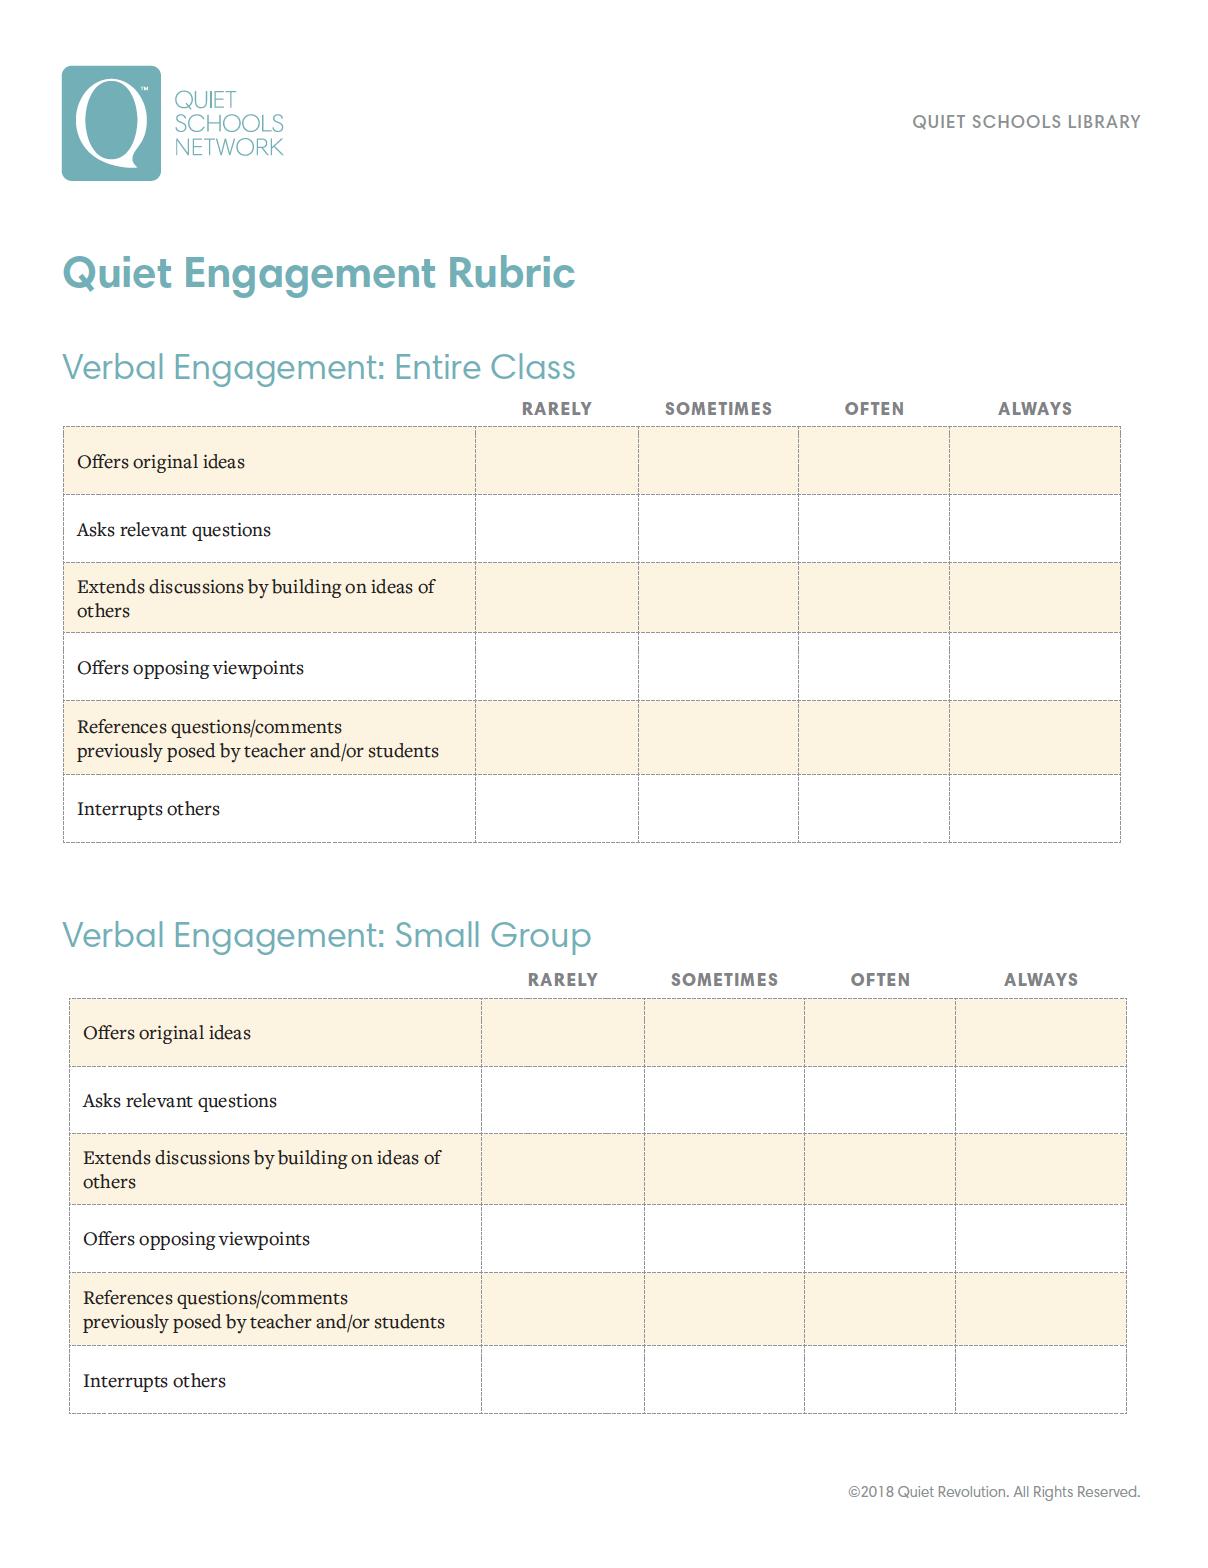 Resources for Schools - Quiet Revolution